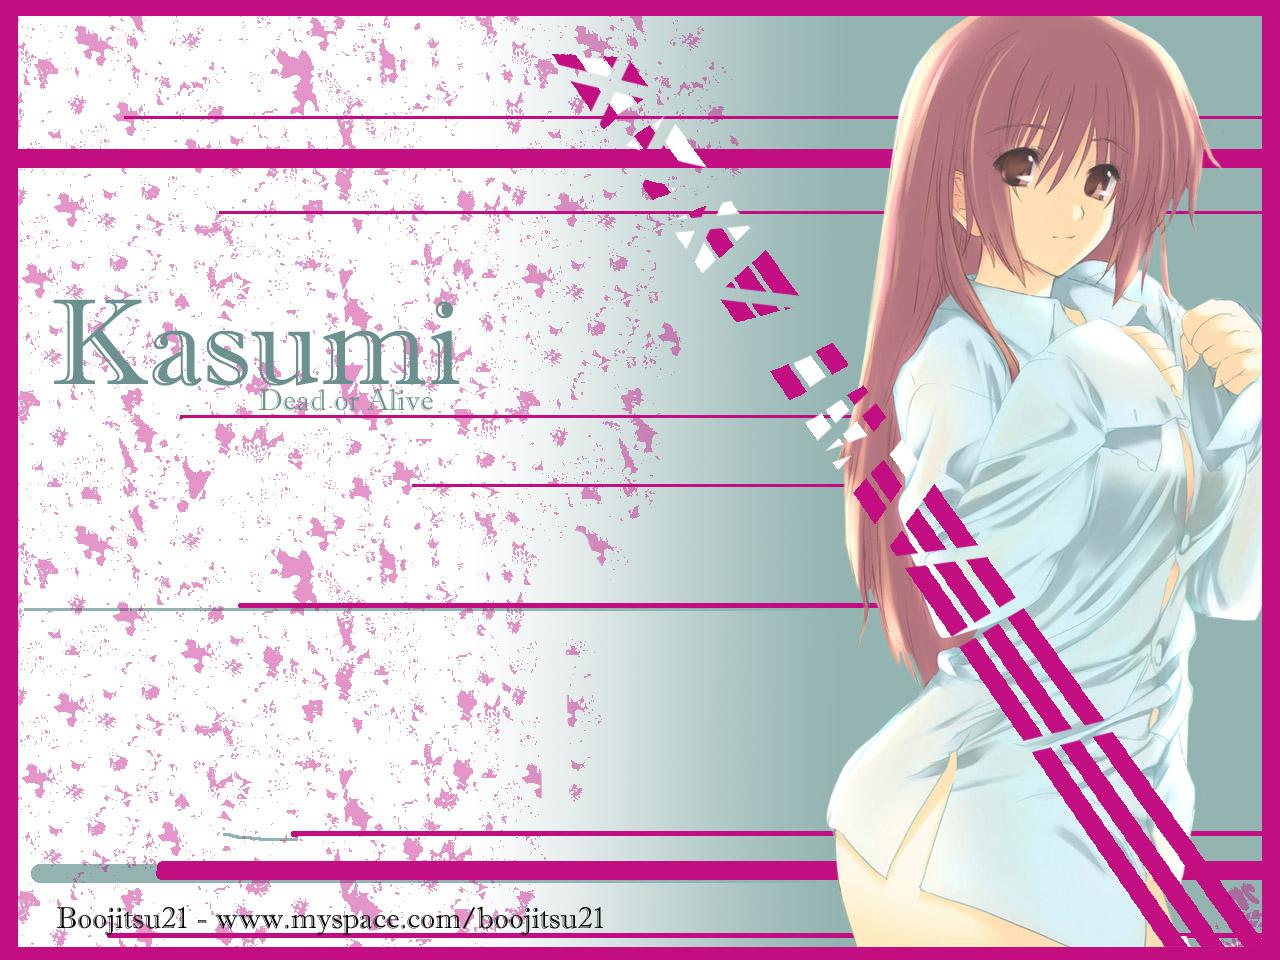 dead_or_alive iizuki_tasuku kasumi